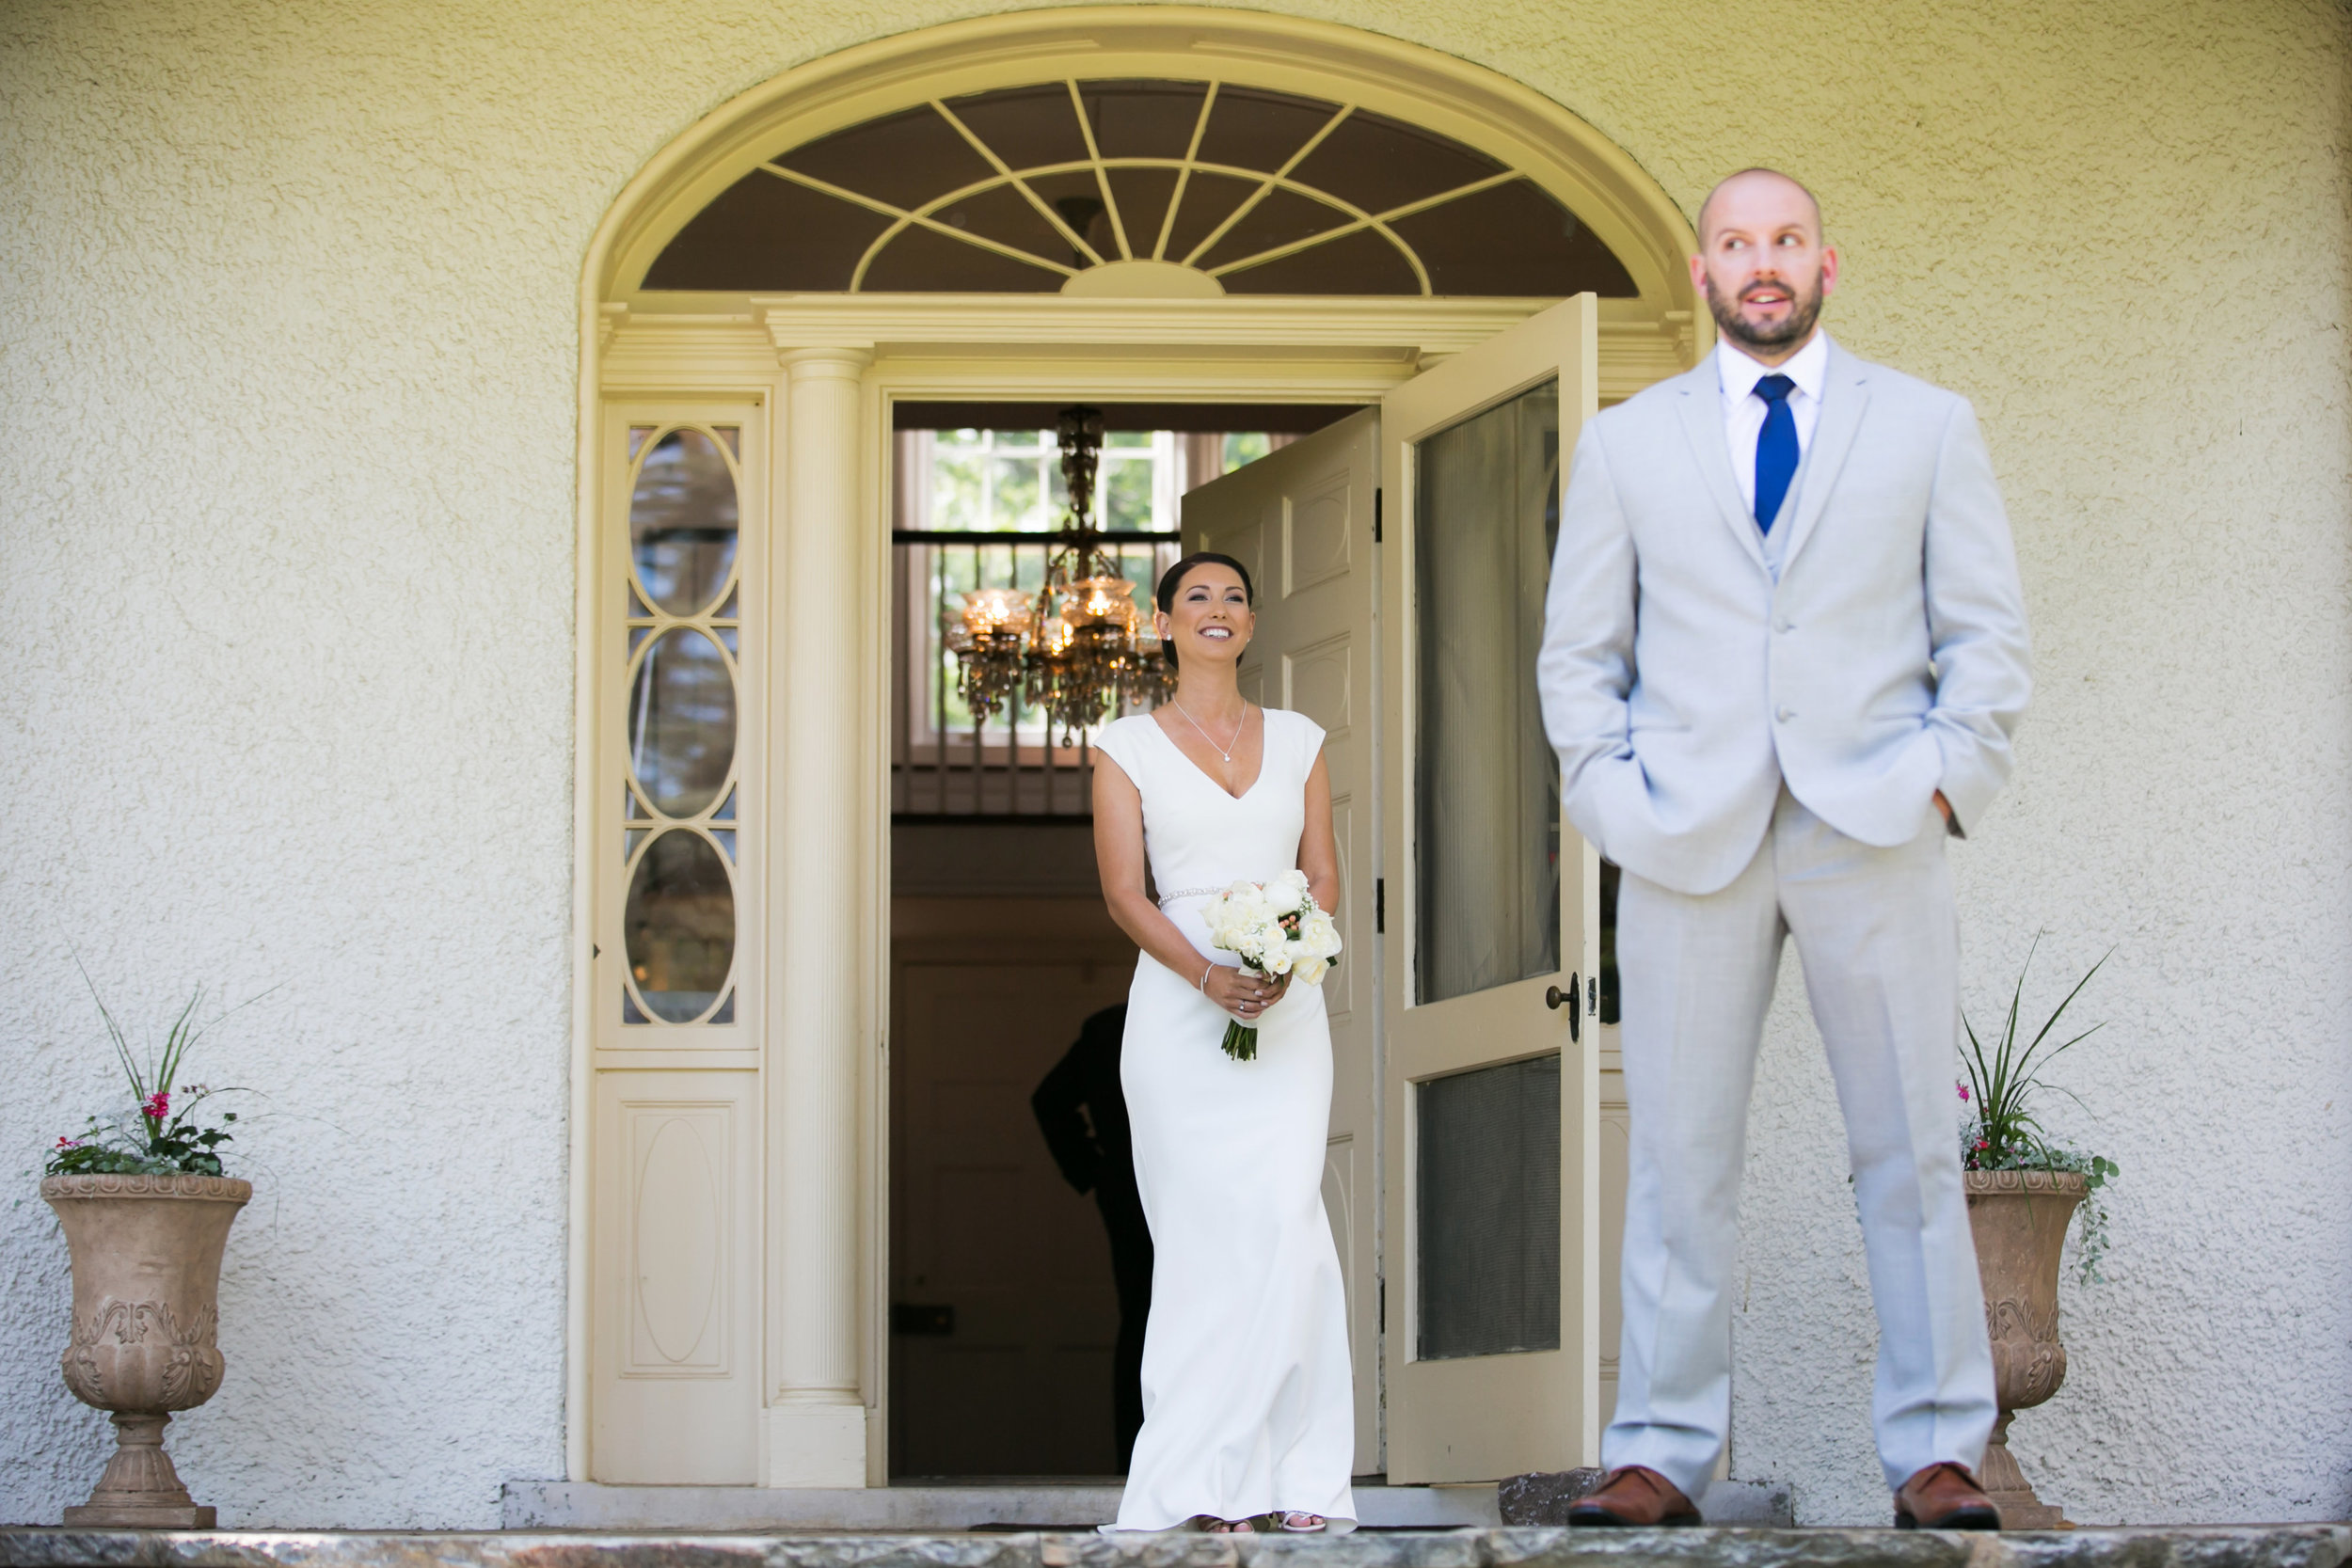 Pure elegance events Tynise Kee dc wedding planner va wedding planner rust manor house leesburg -0011.jpg